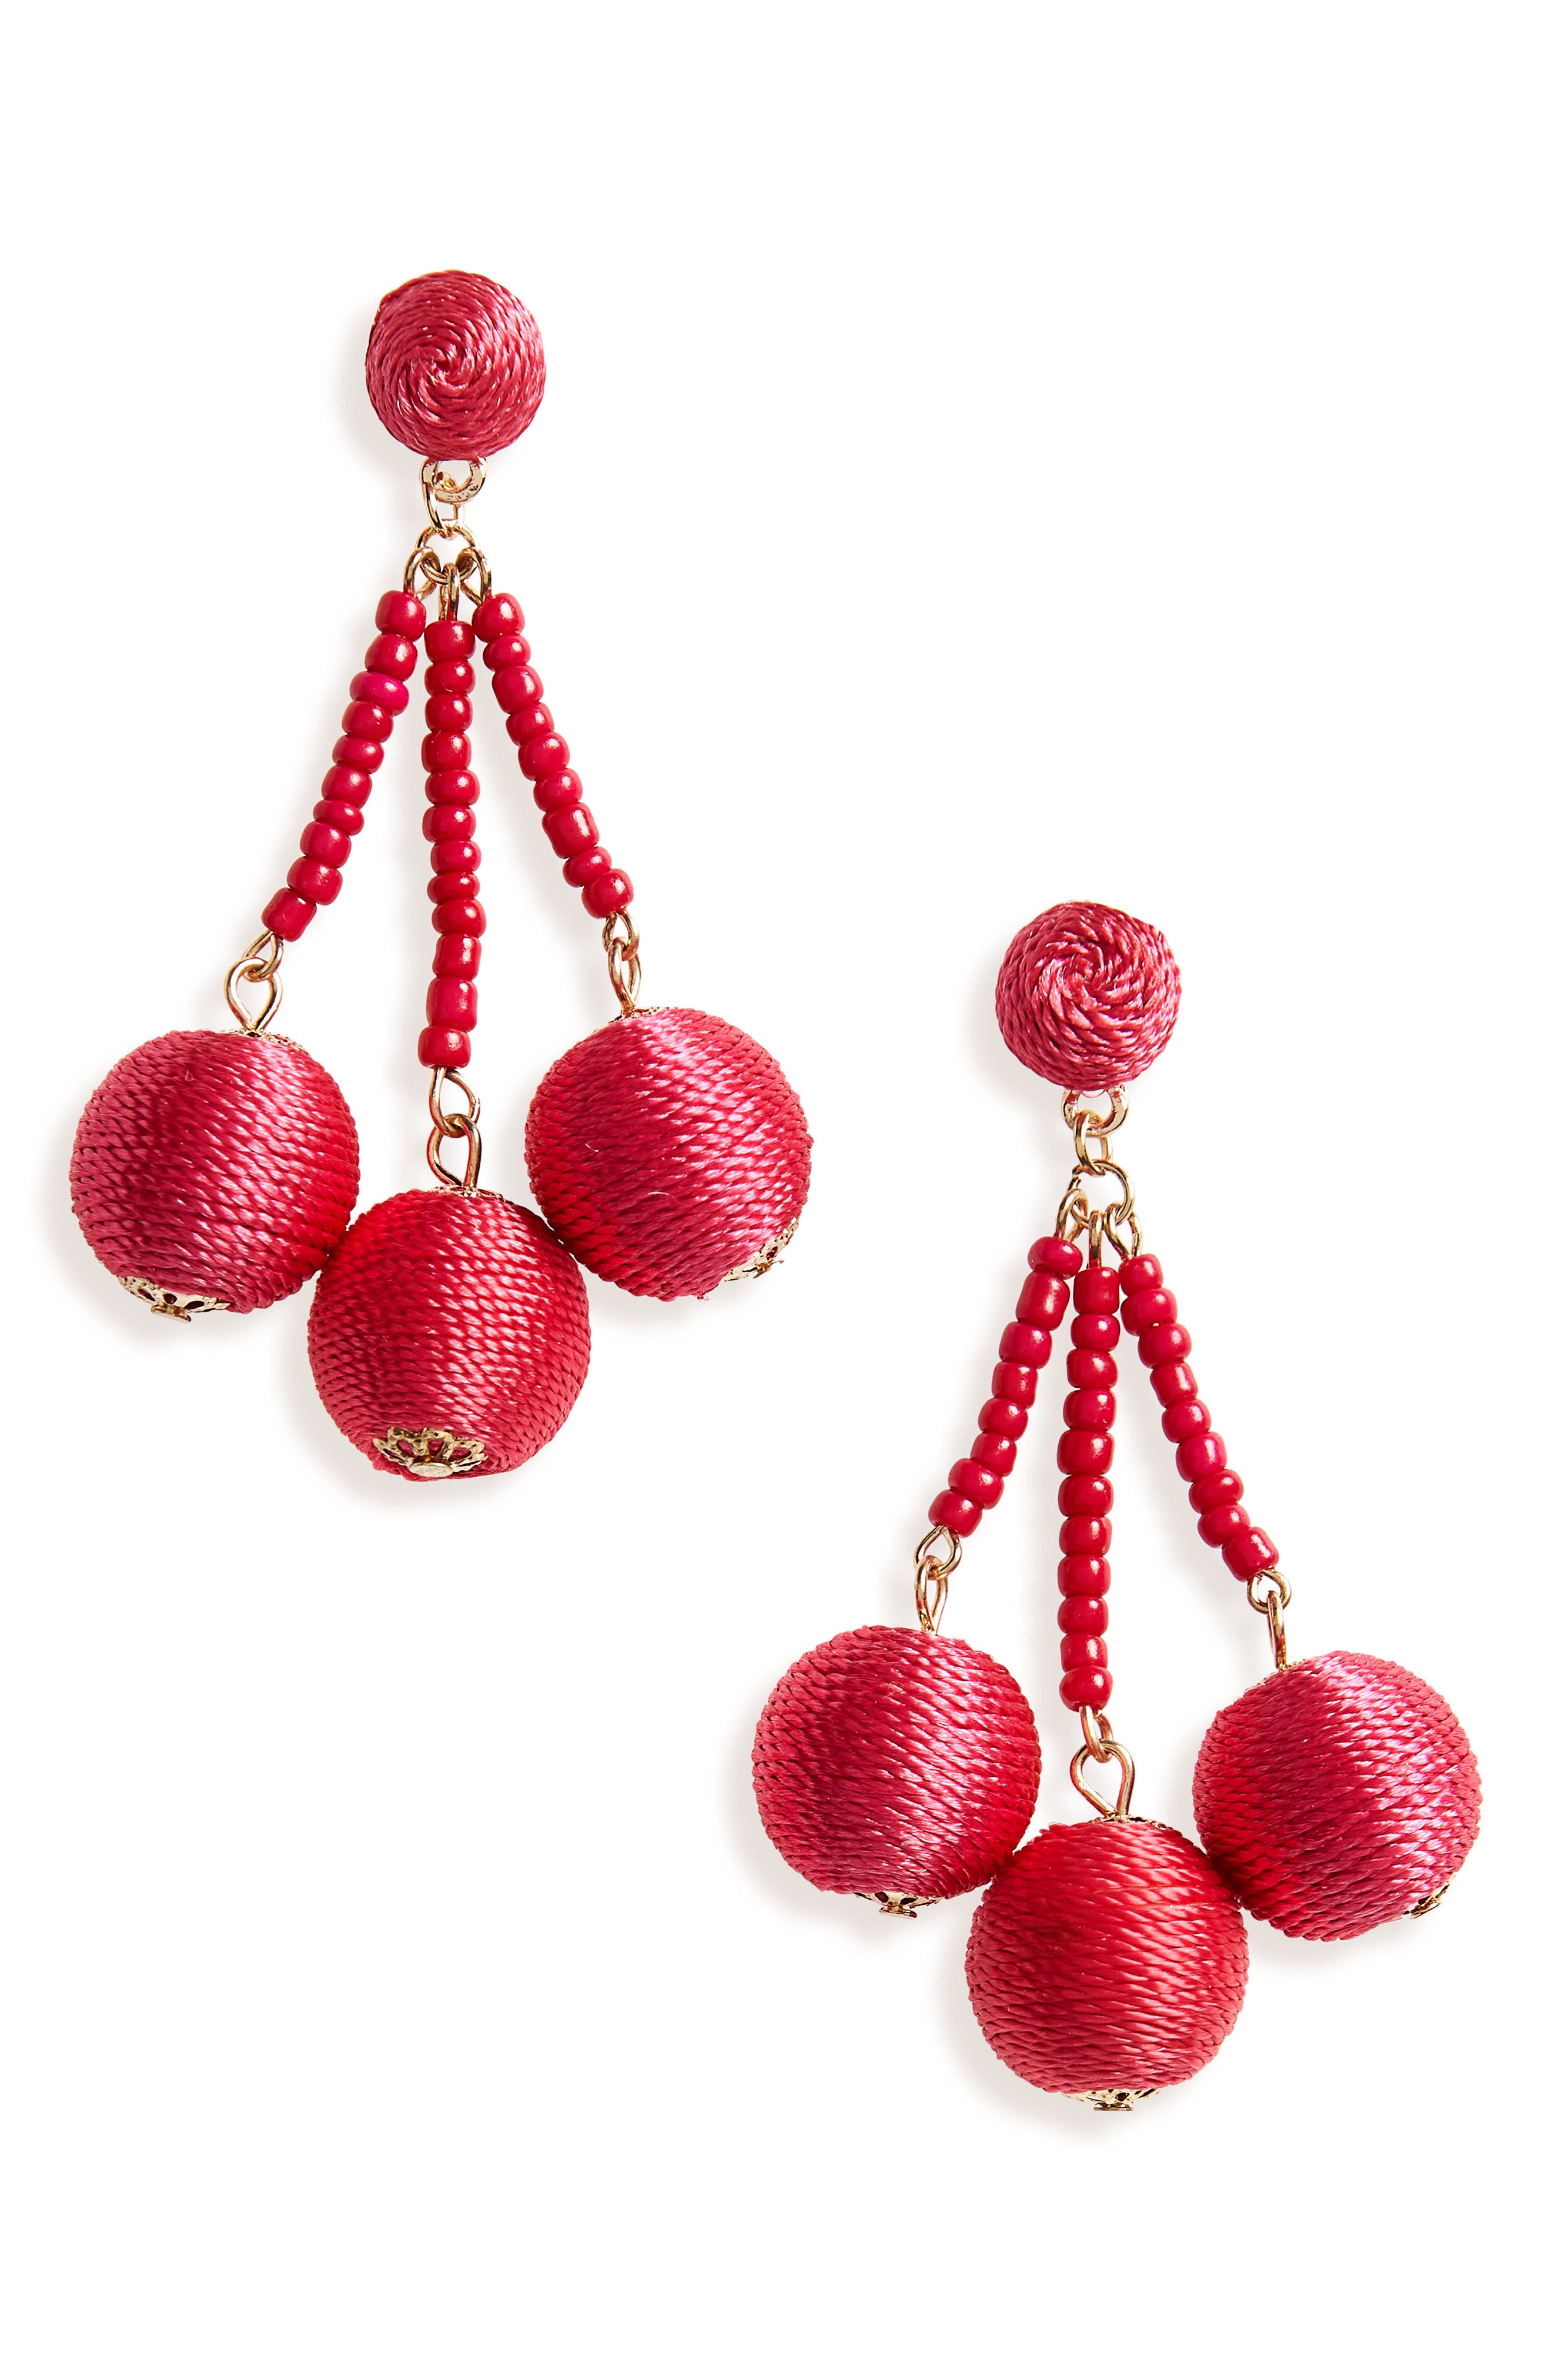 Sphere Drop Earrings,                             Main thumbnail 1, color,                             650